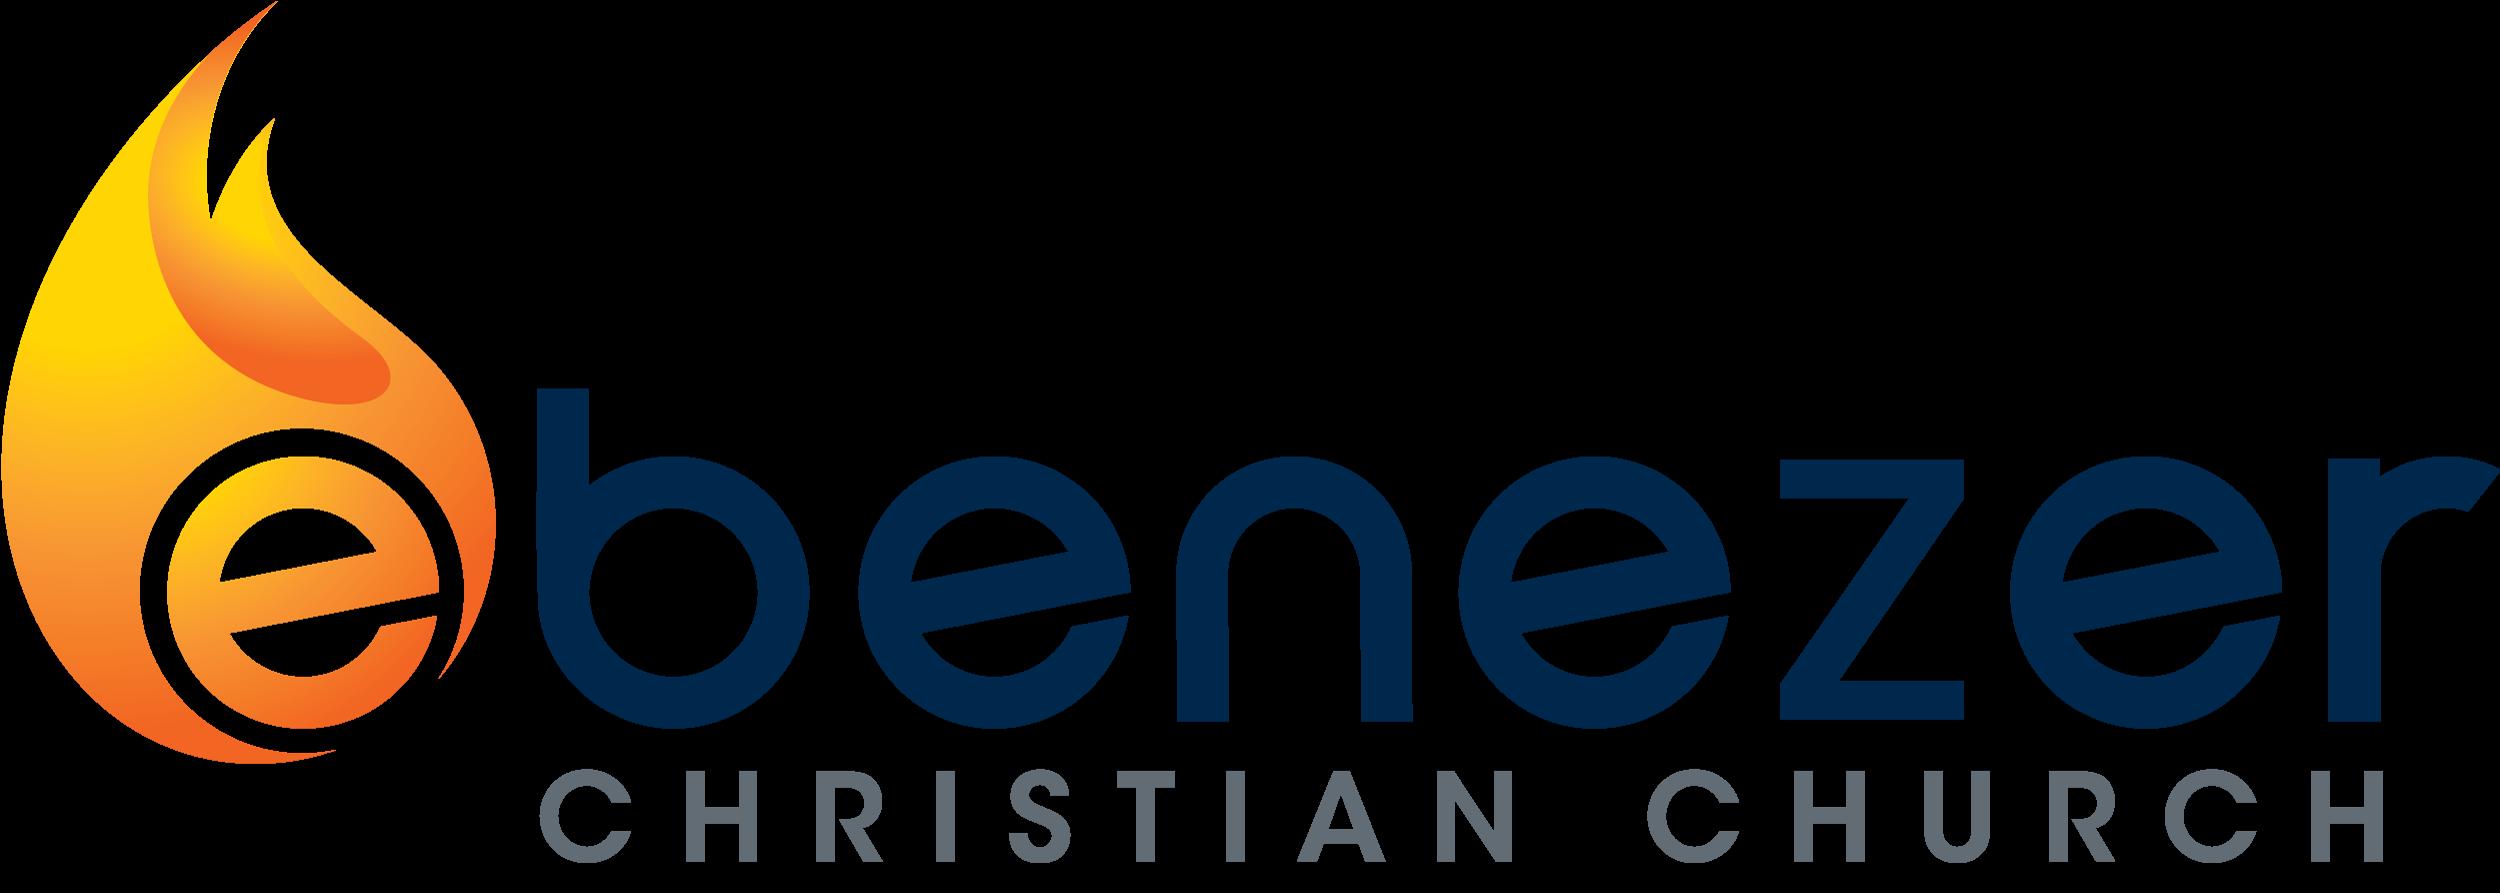 Ebenezer Christian Church